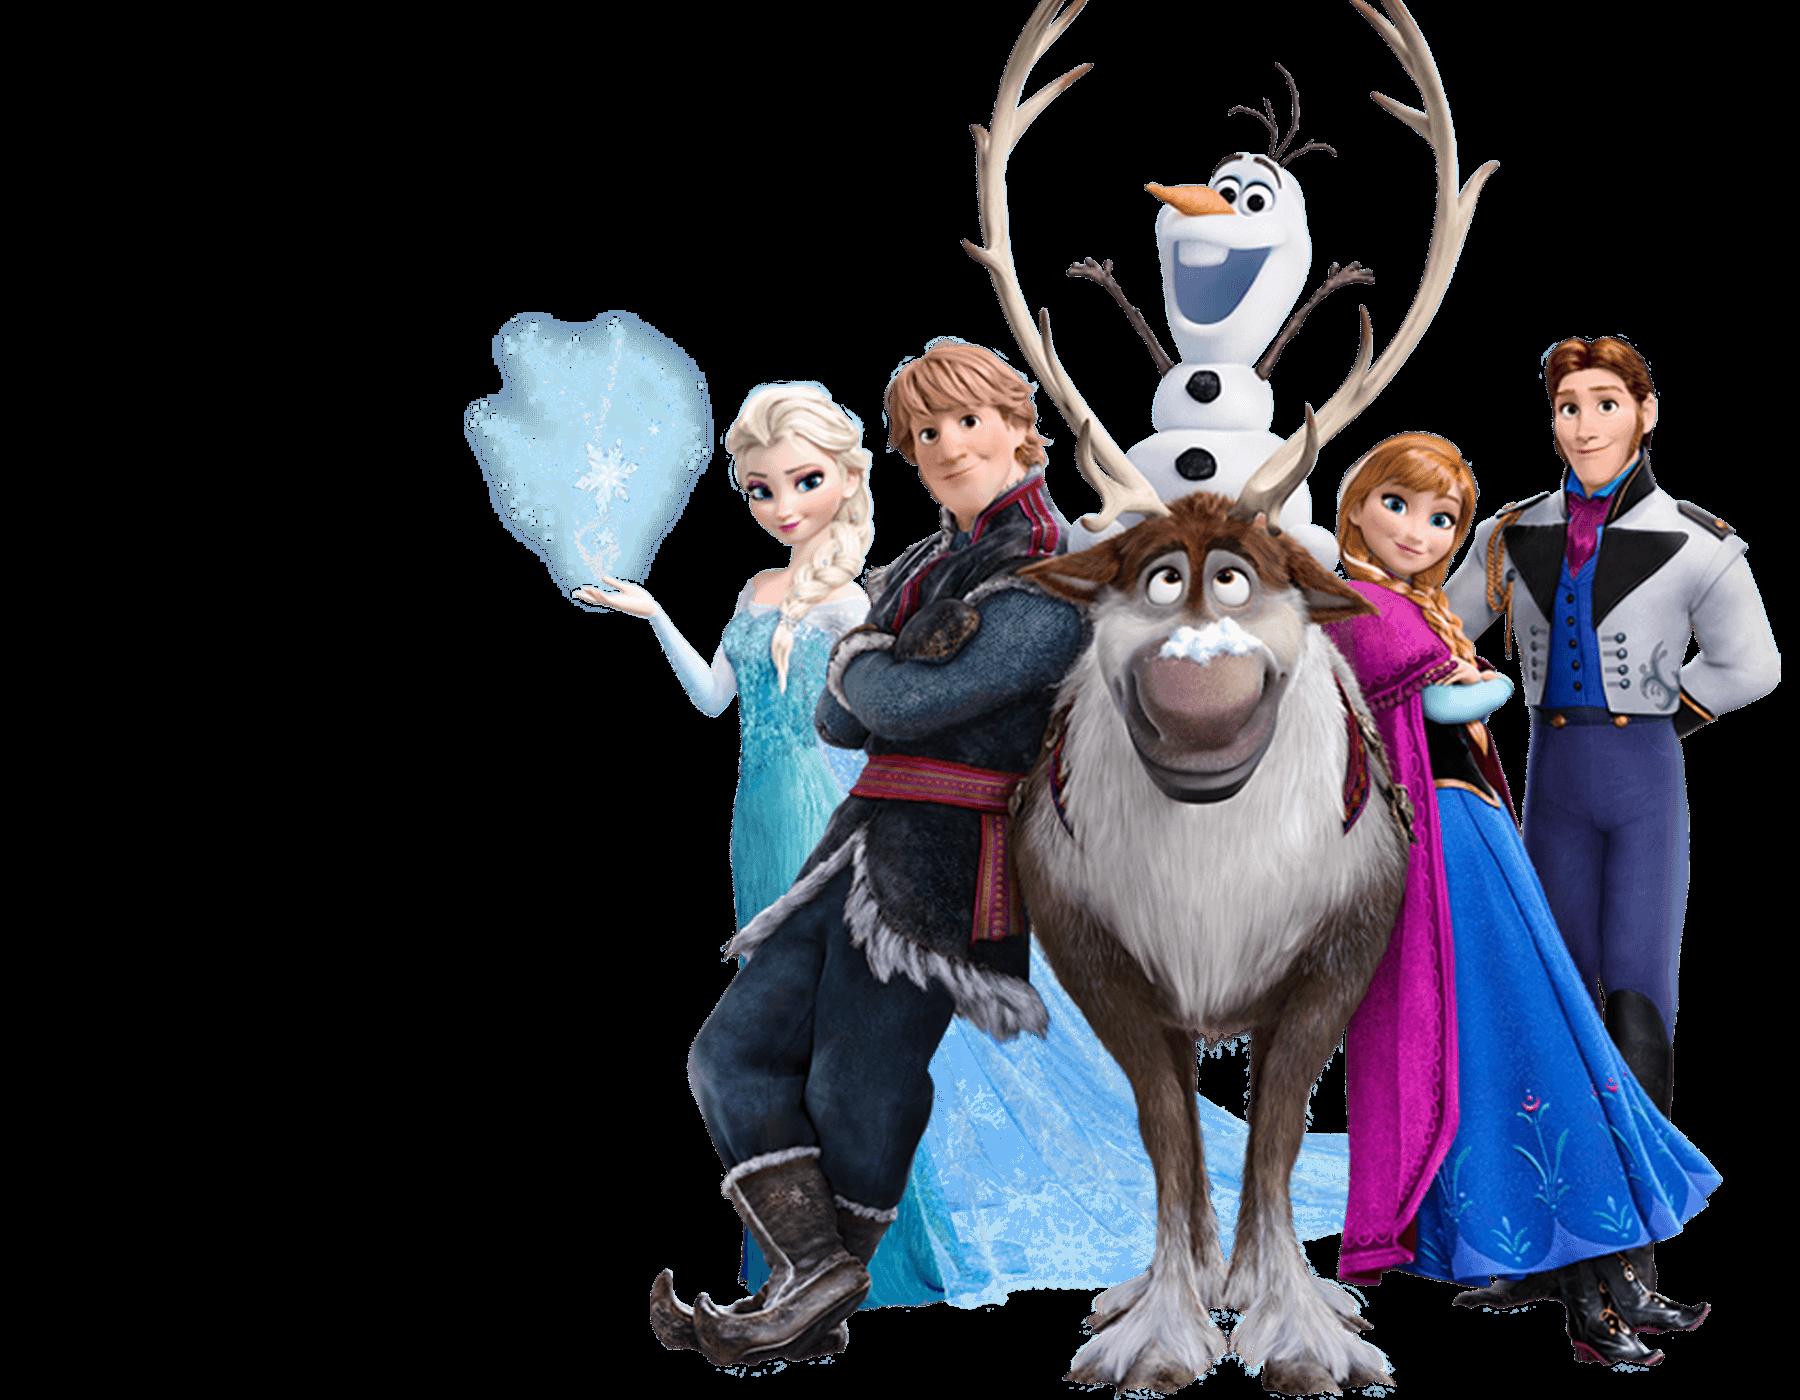 Disney's Frozen Characters Clipart - Clipart Kid